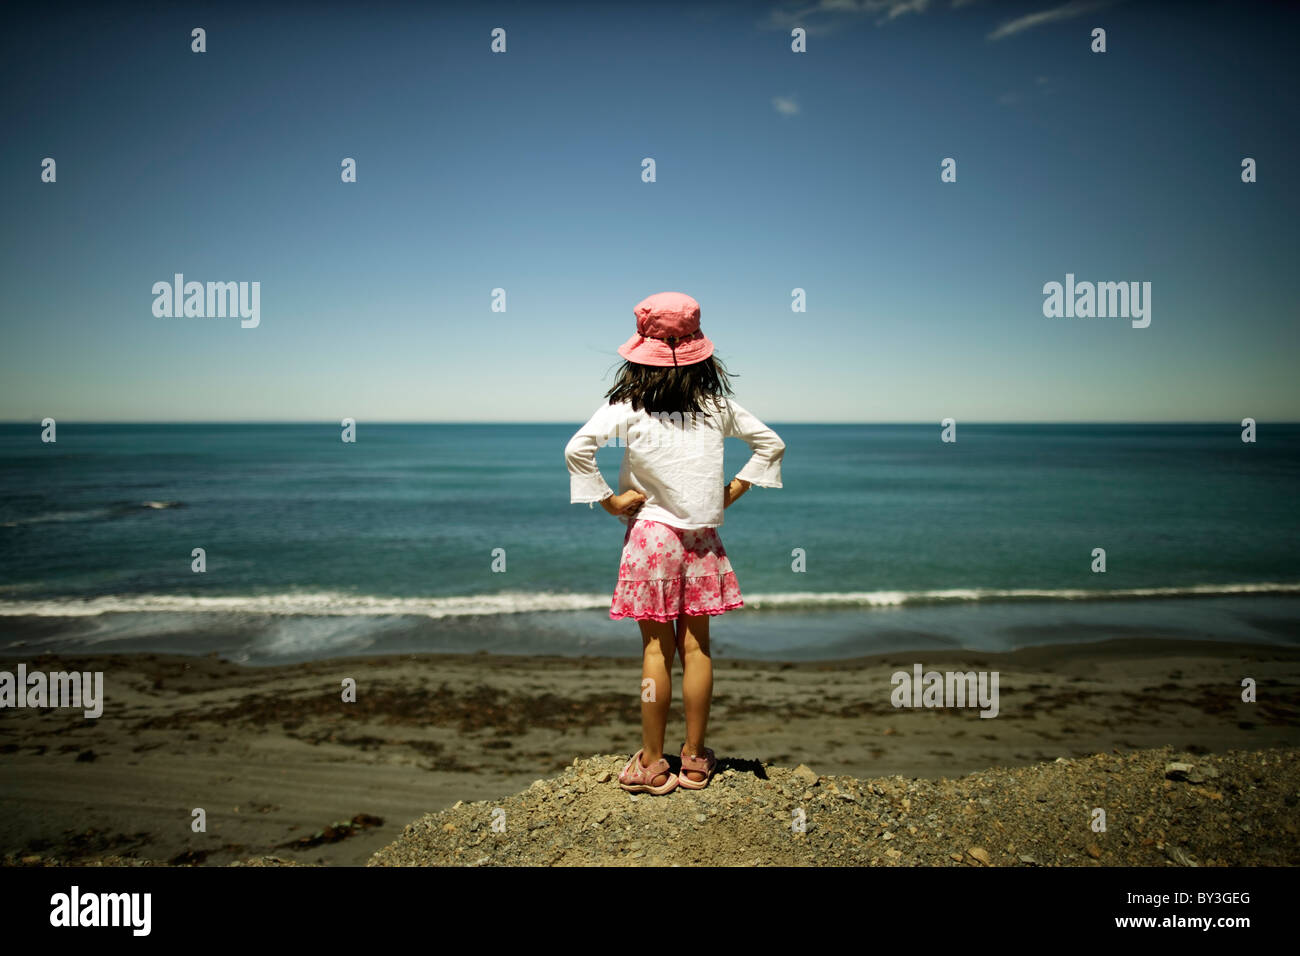 Girl looks at ocean, Wellington, New Zealand - Stock Image